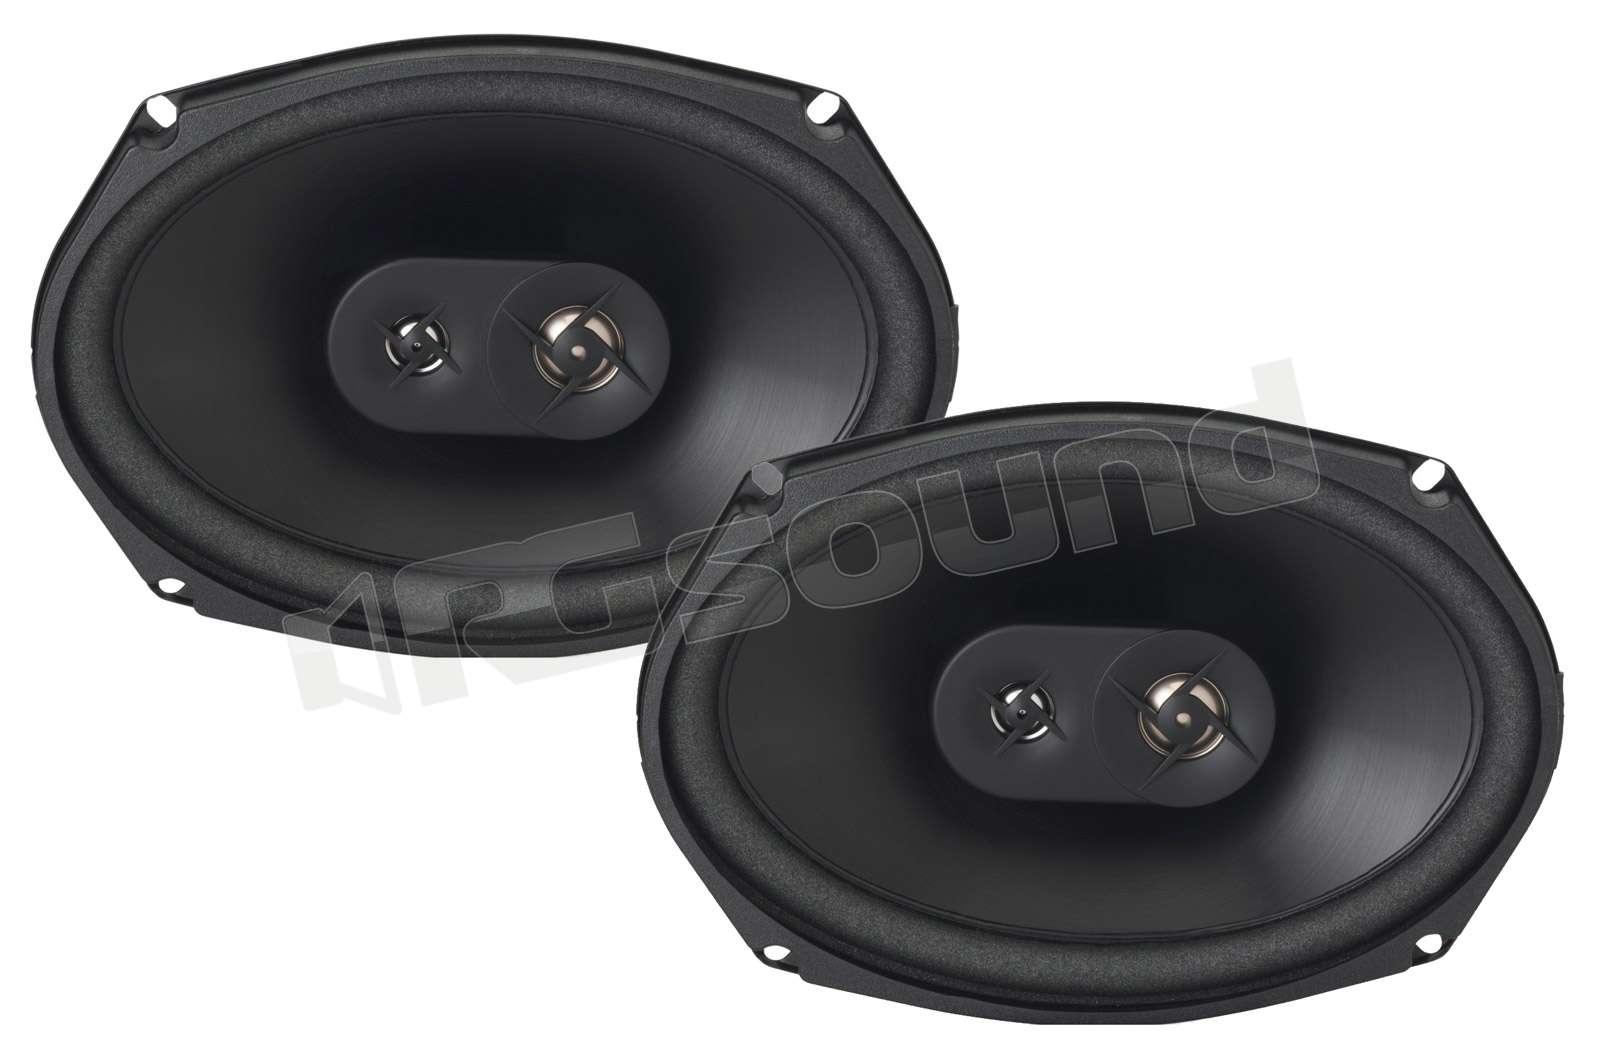 Jbl cs 69 coassiali coassiali ellittici 6x9 :: rg sound store ::